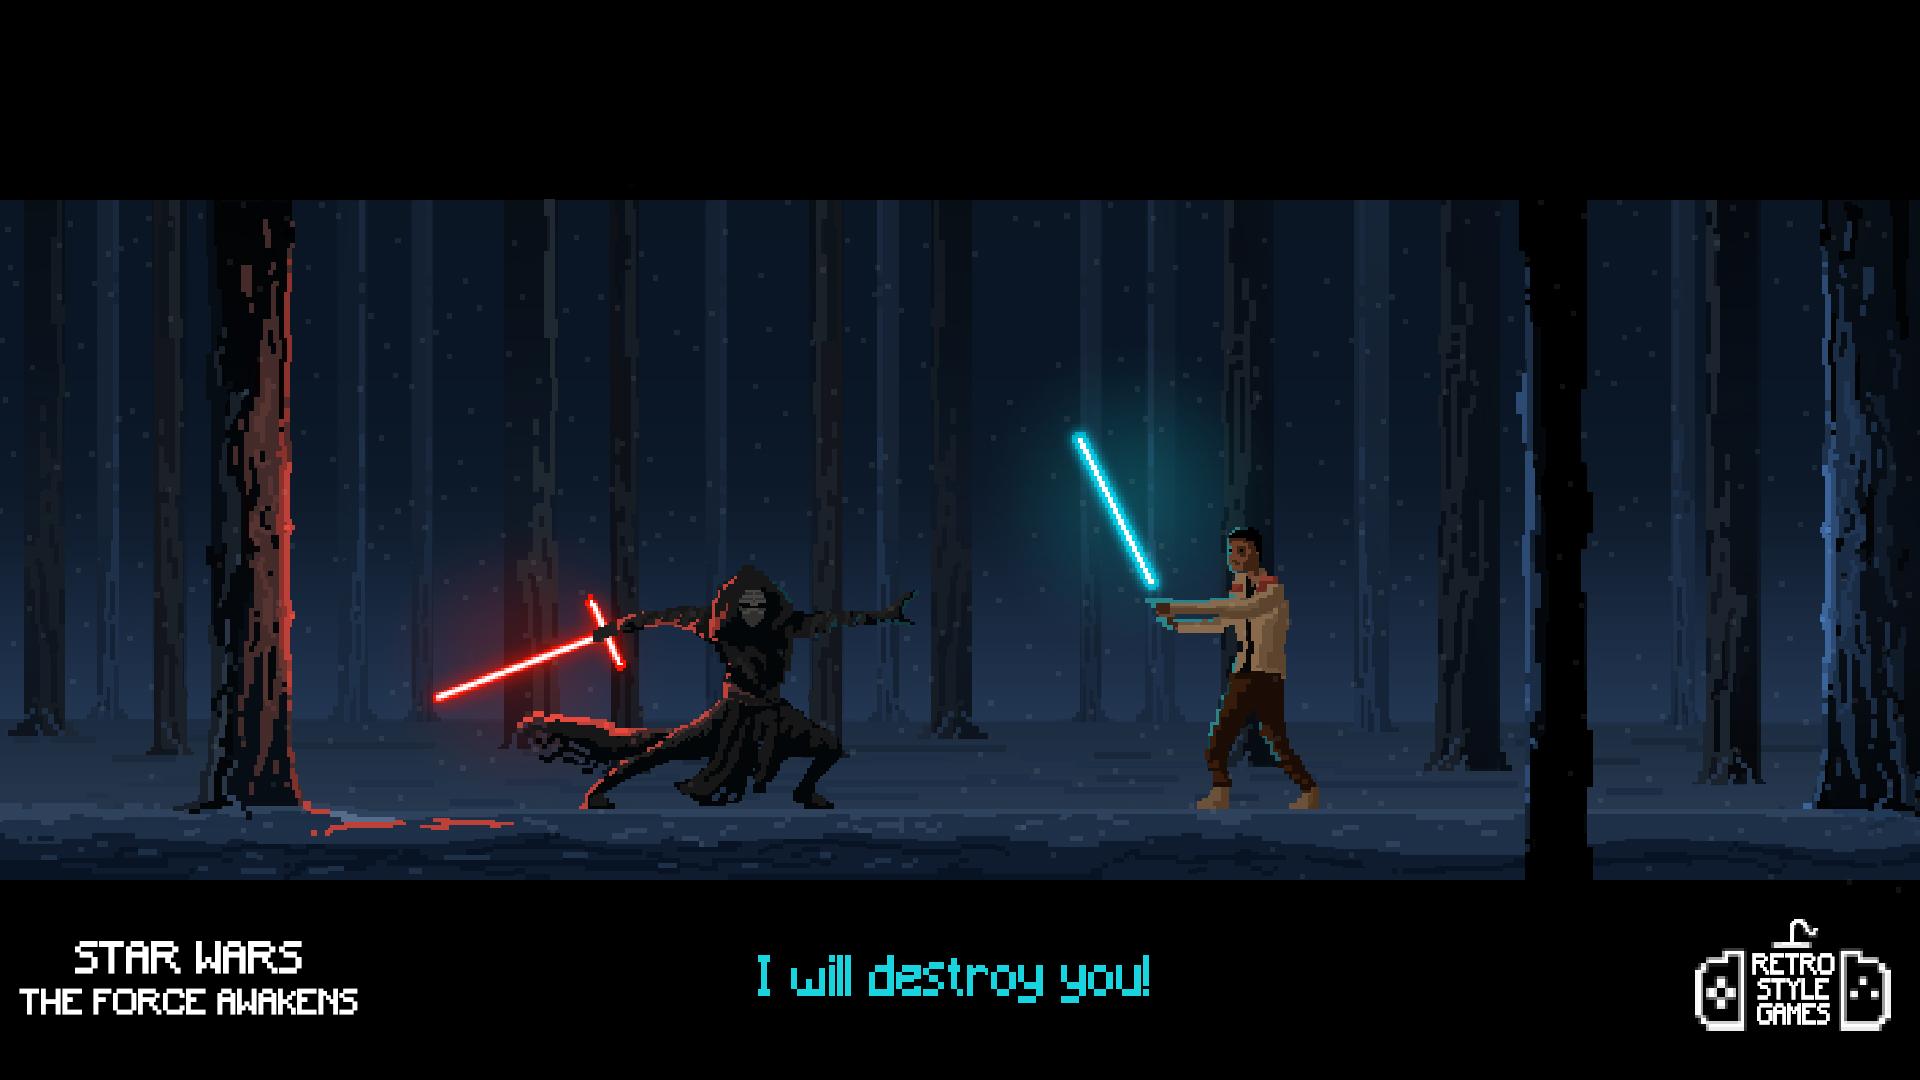 03-StarWars-Kylo-Ren-Finn-forest-fight-pixel-art